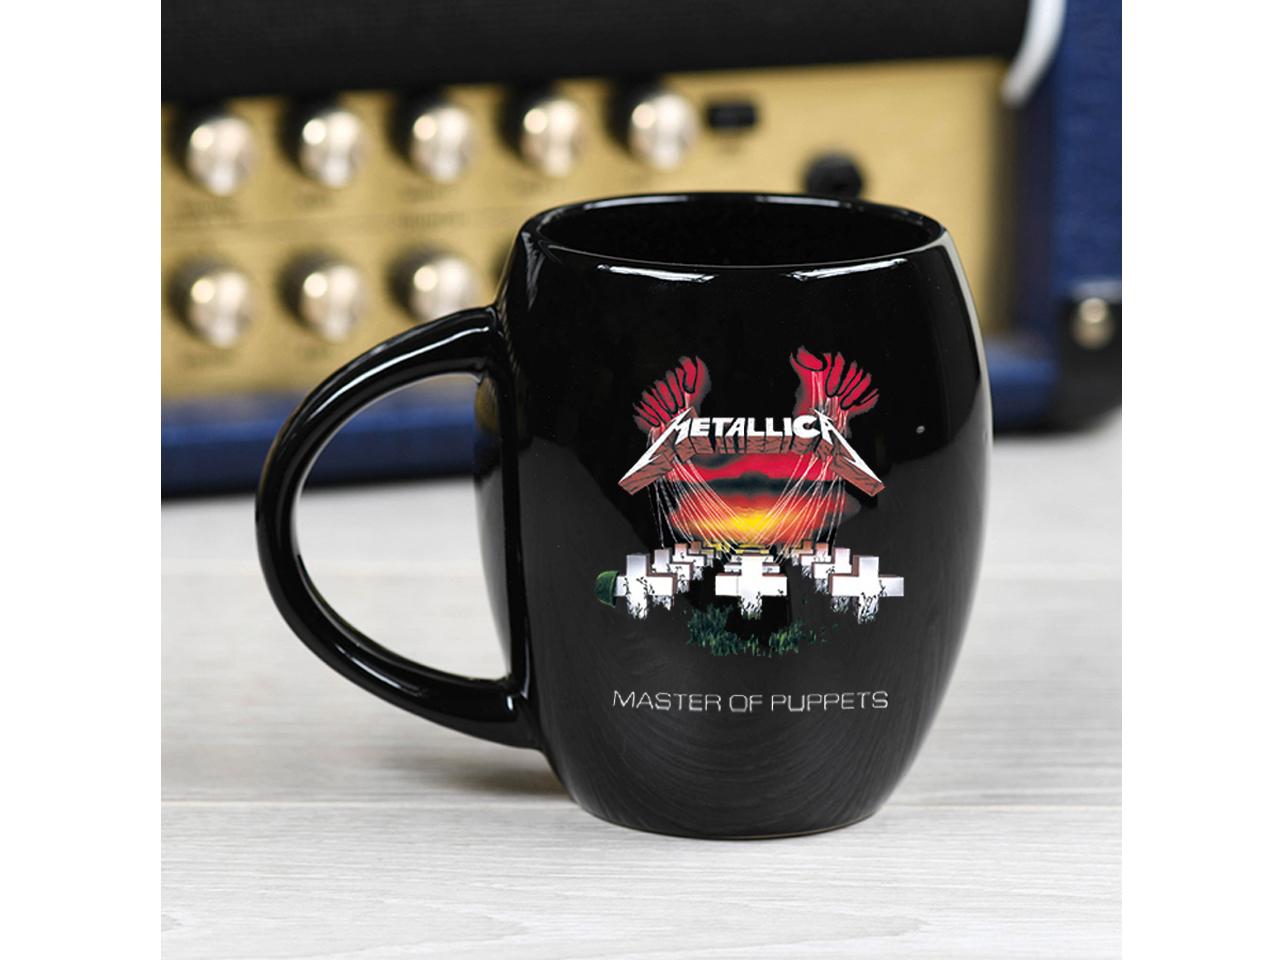 Metallica Black Oval Mug Official Band Merch Master Of Puppets Logo Iconic Music Rock Classic Retro Nostalgia